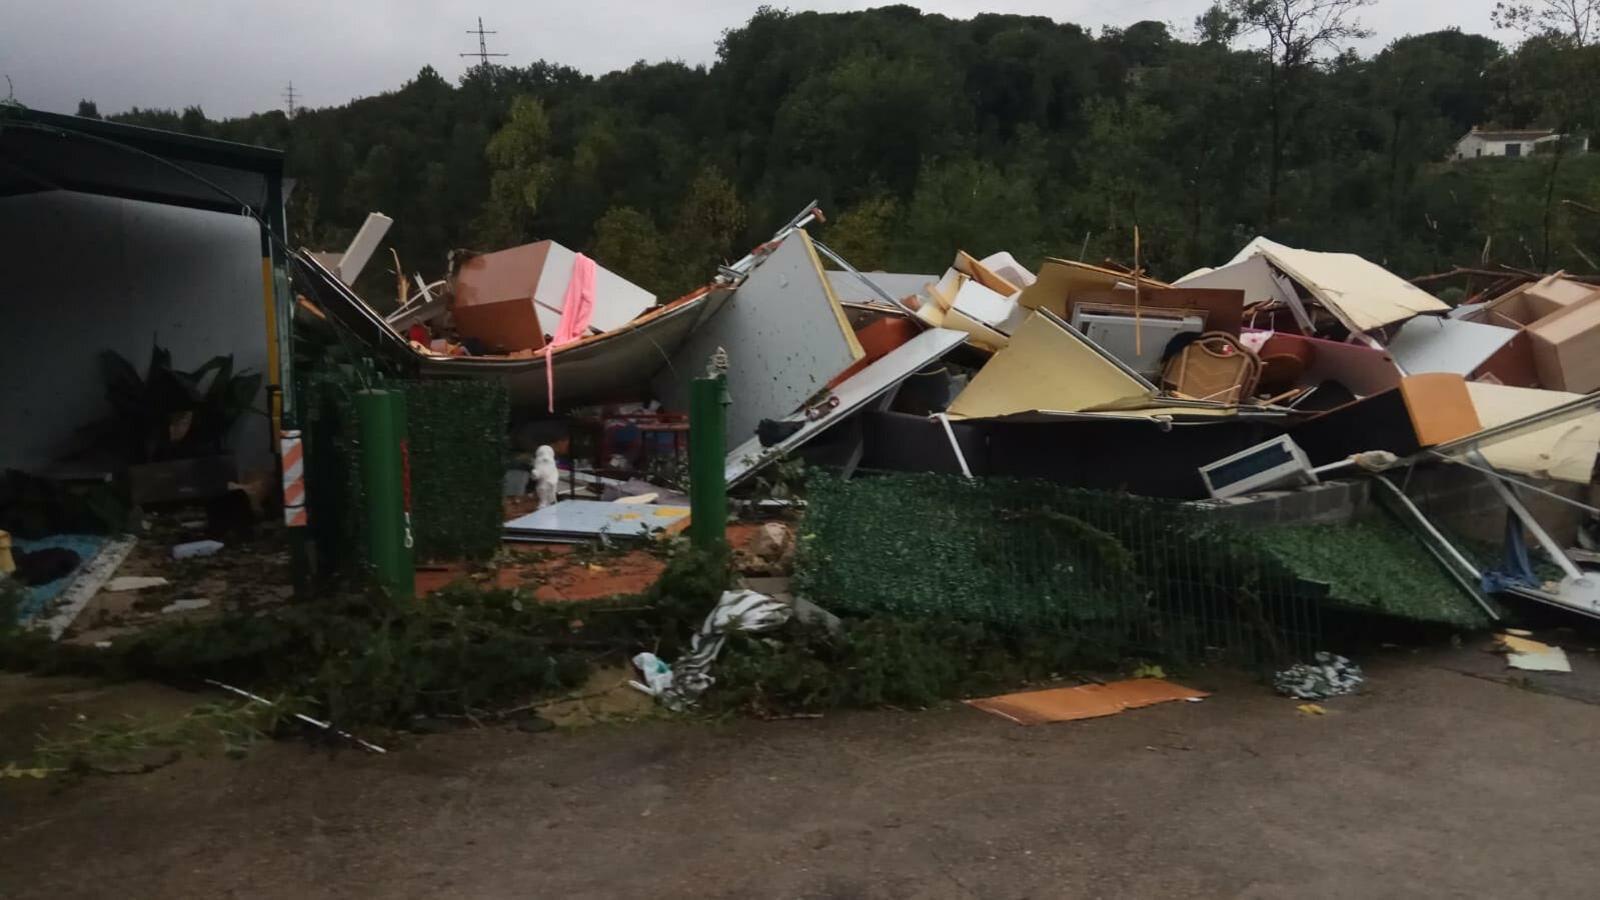 Un possible tornado destrossa un càmping a Gualba